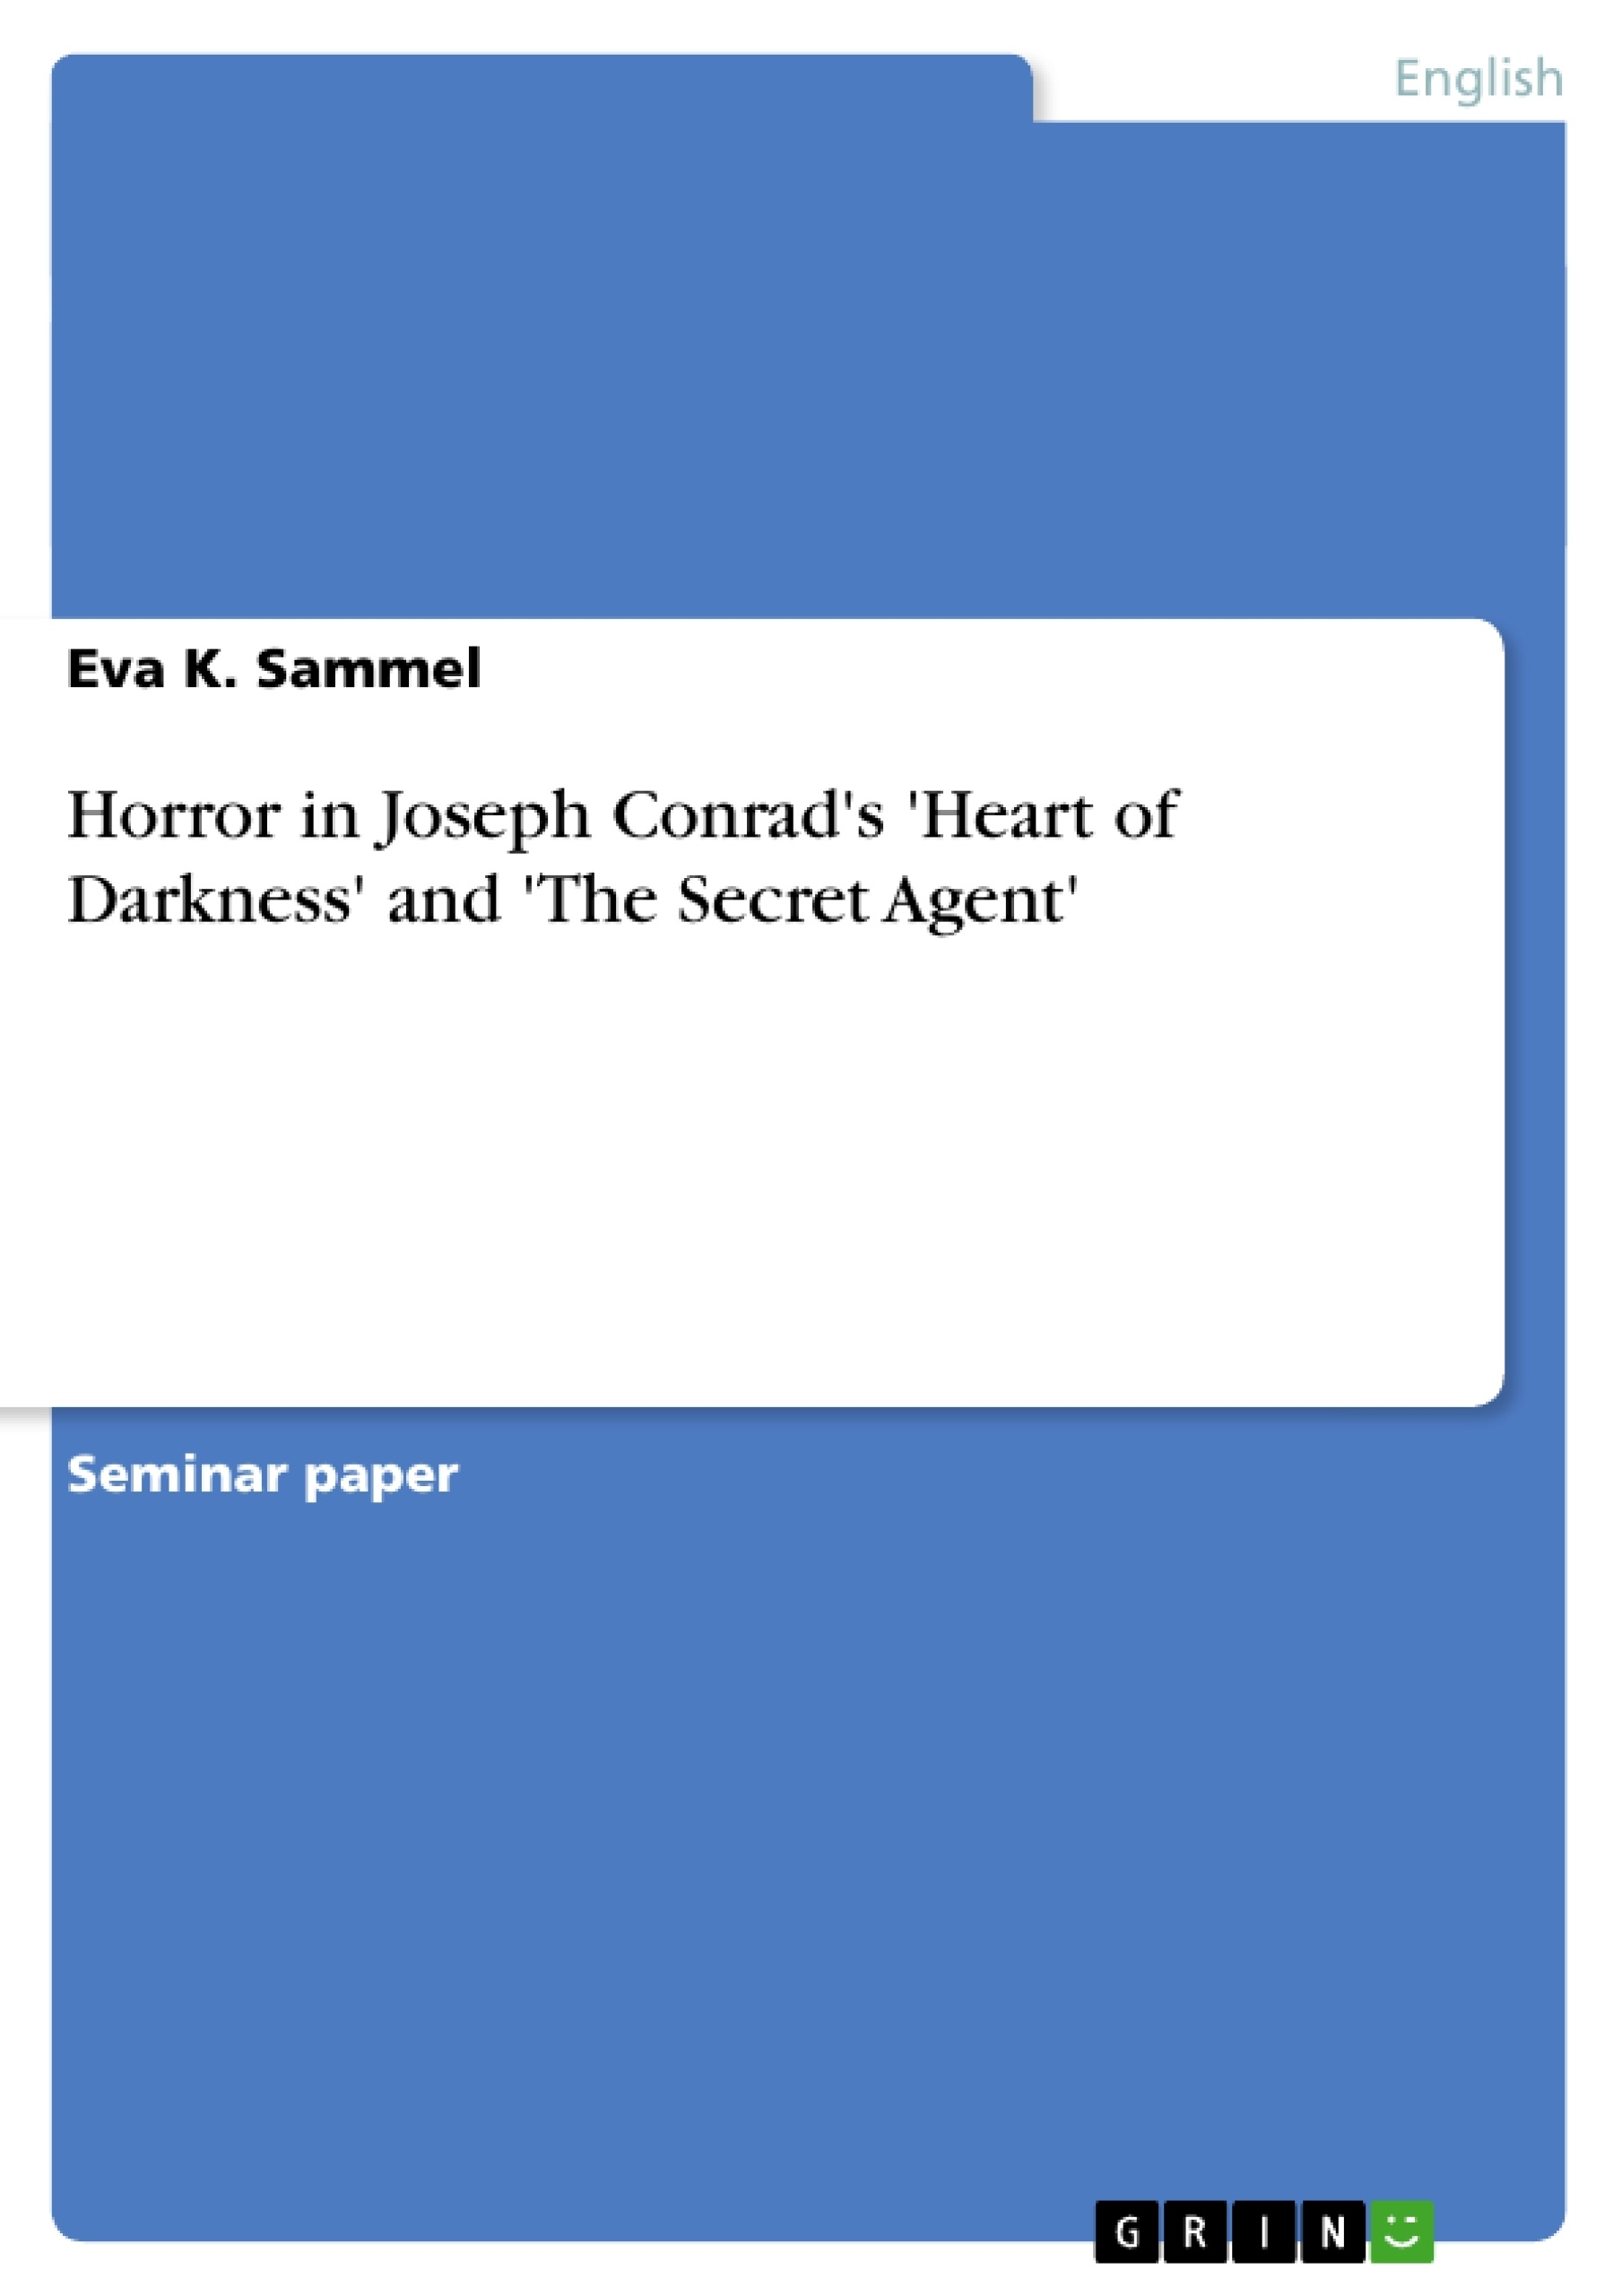 Title: Horror in Joseph Conrad's 'Heart of Darkness' and 'The Secret Agent'